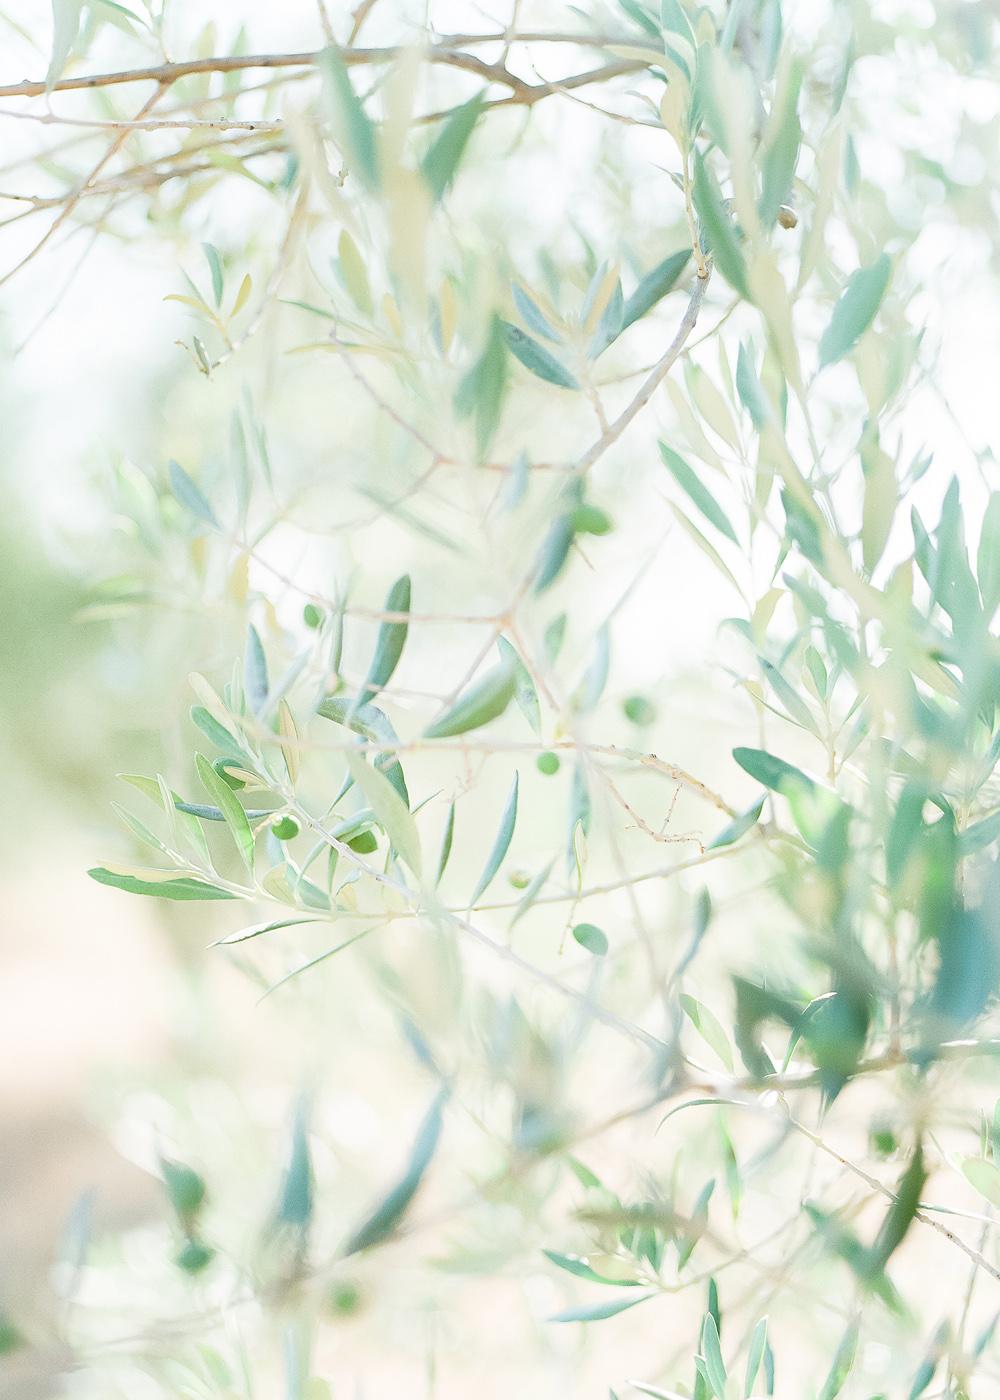 anouschka rokebrand, fine art marriage, provence france anniversary, olive tree